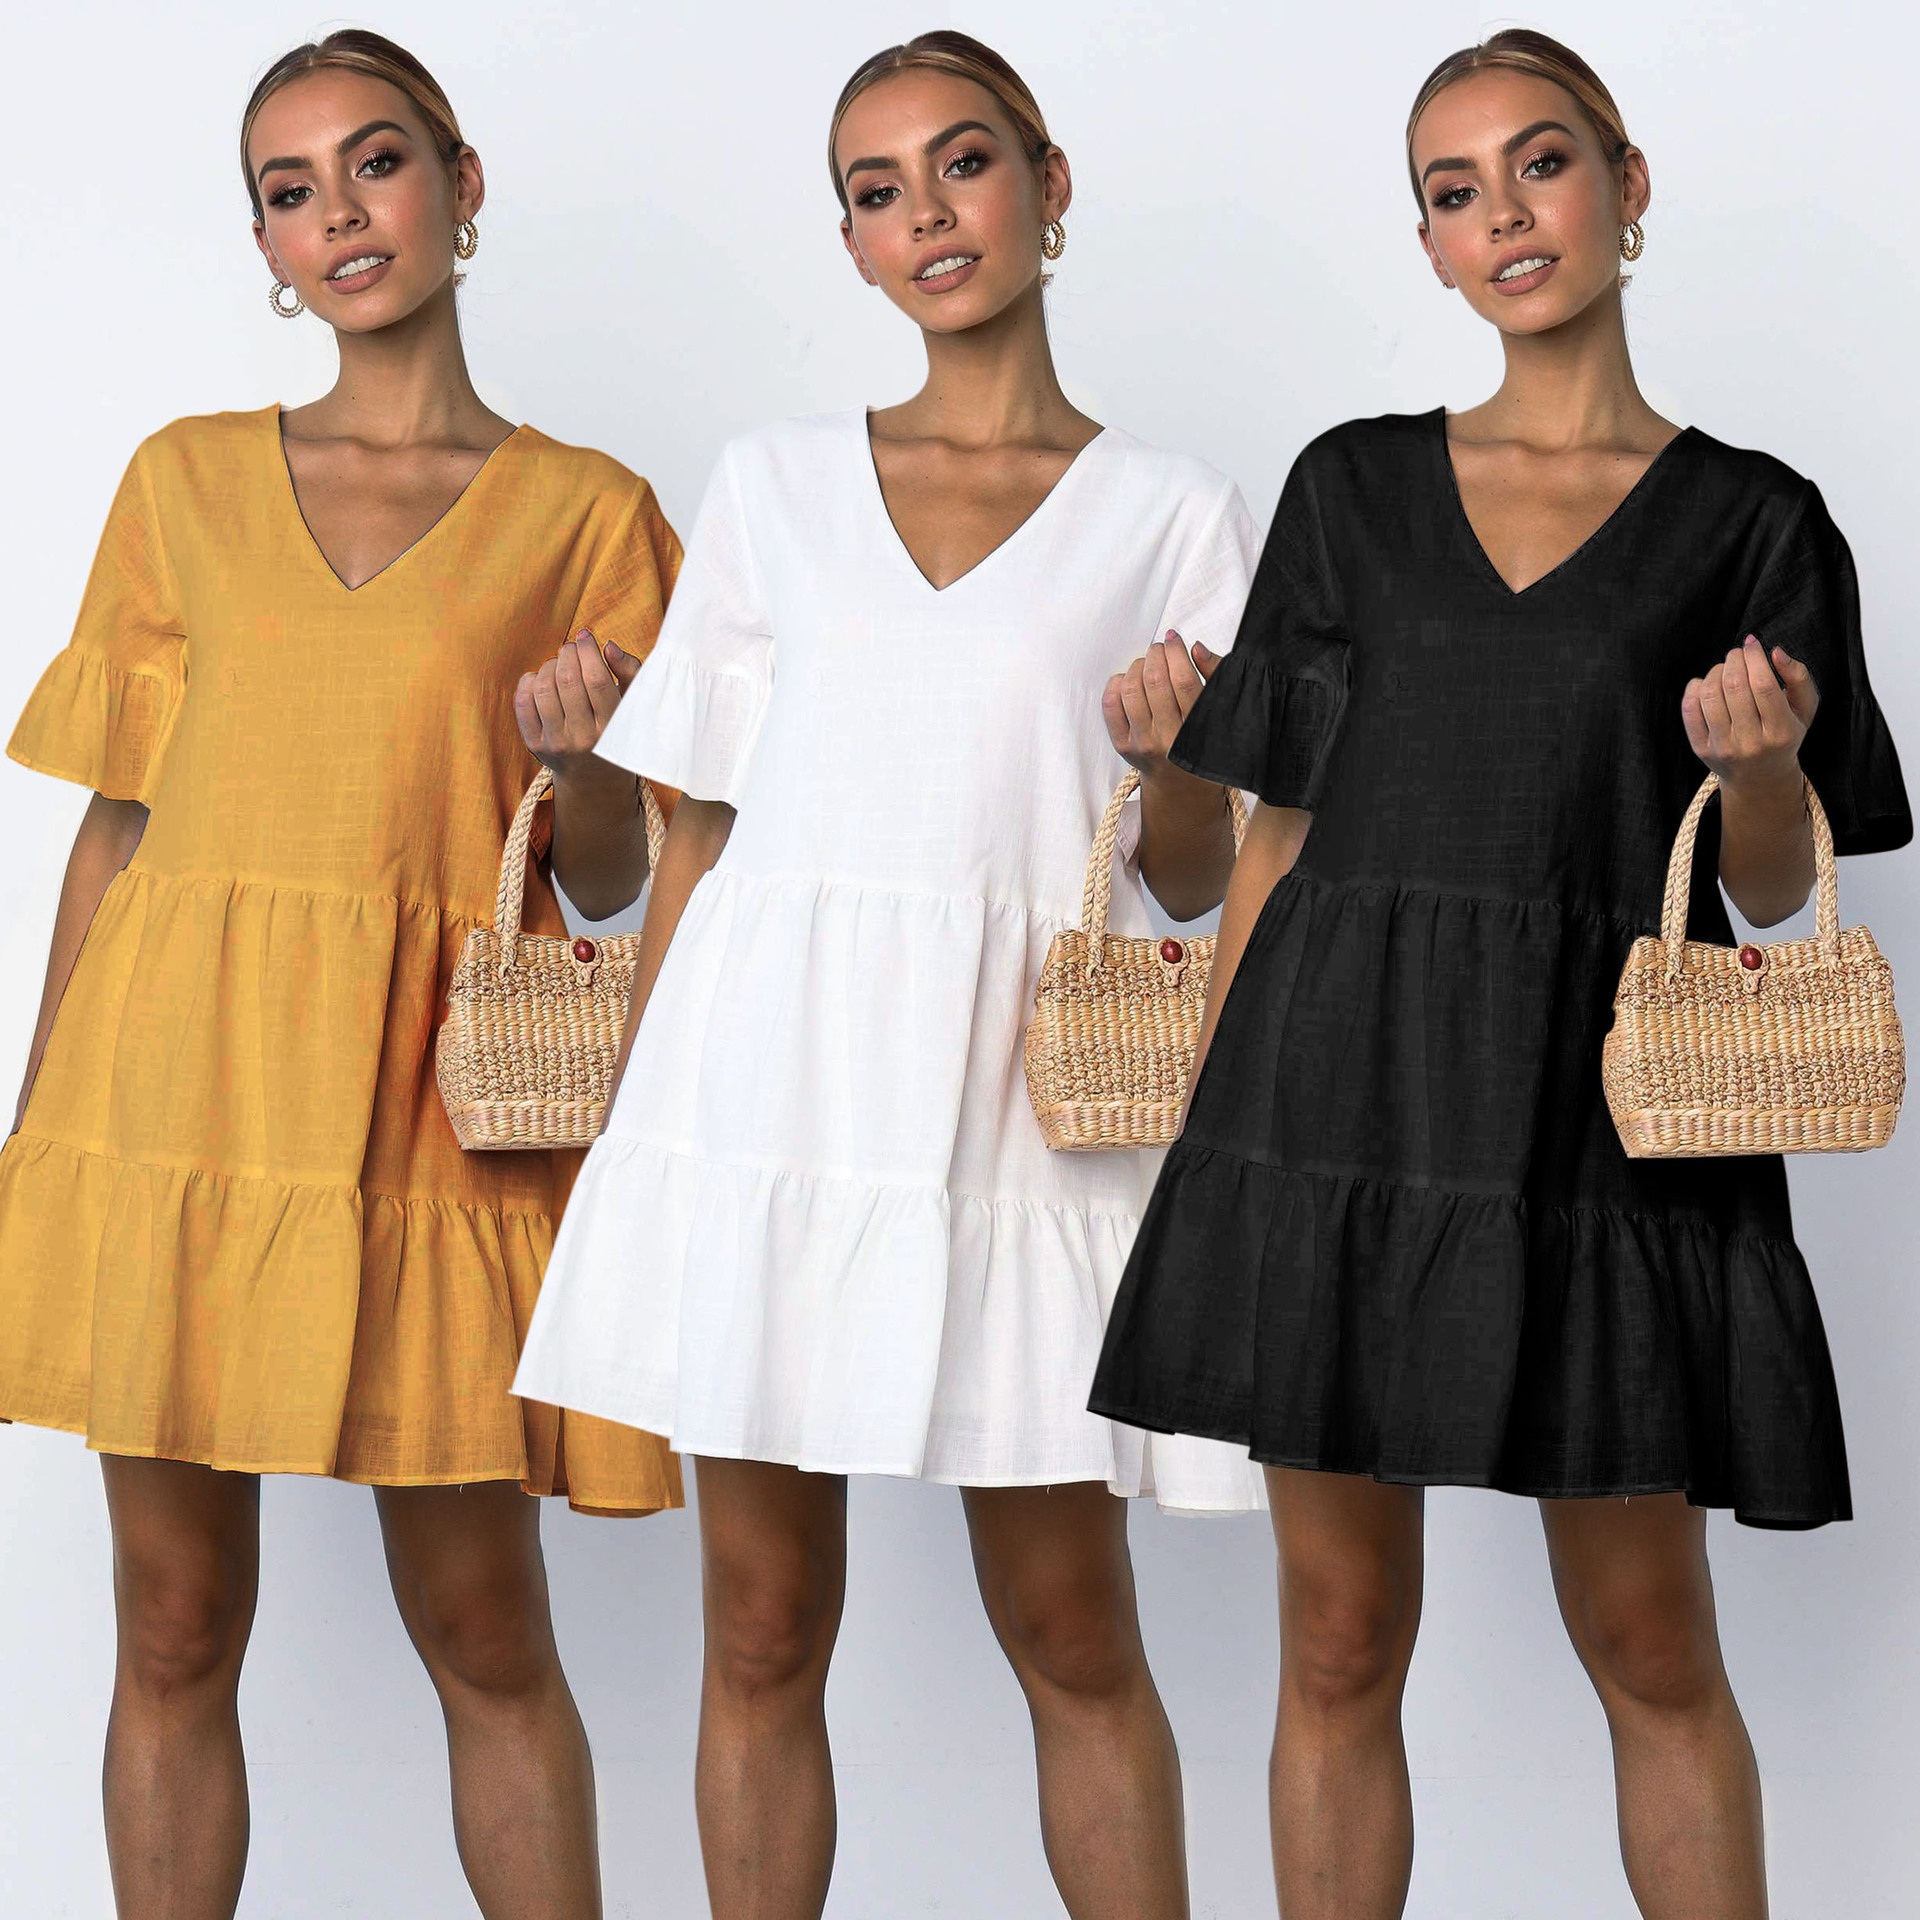 2019 Summer Beachwear Deep V Necek Short Sleeve White Ruffled A-line Mini Dress Women Dress Sexy Dress